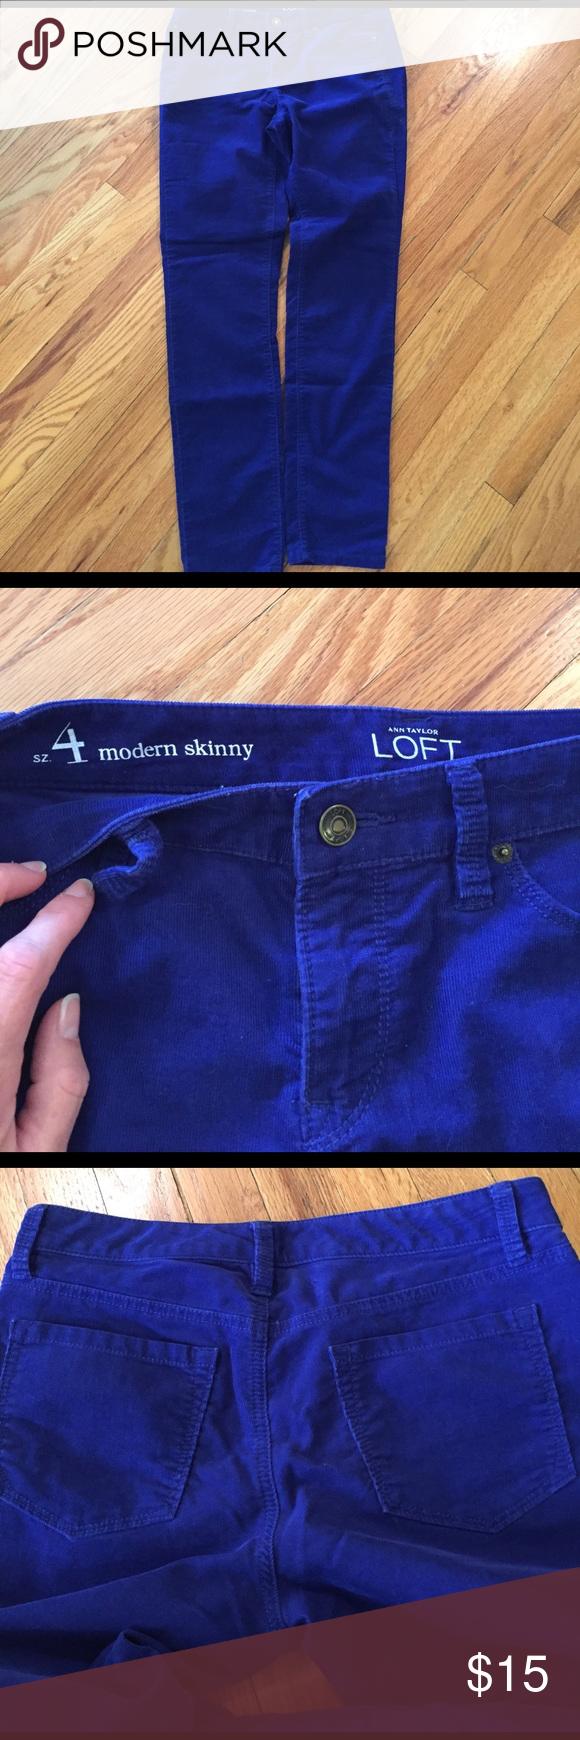 Loft Modern skinny Small wale cords from Loft in royal blue. EUC. MAKE OFFER LOFT Jeans Skinny